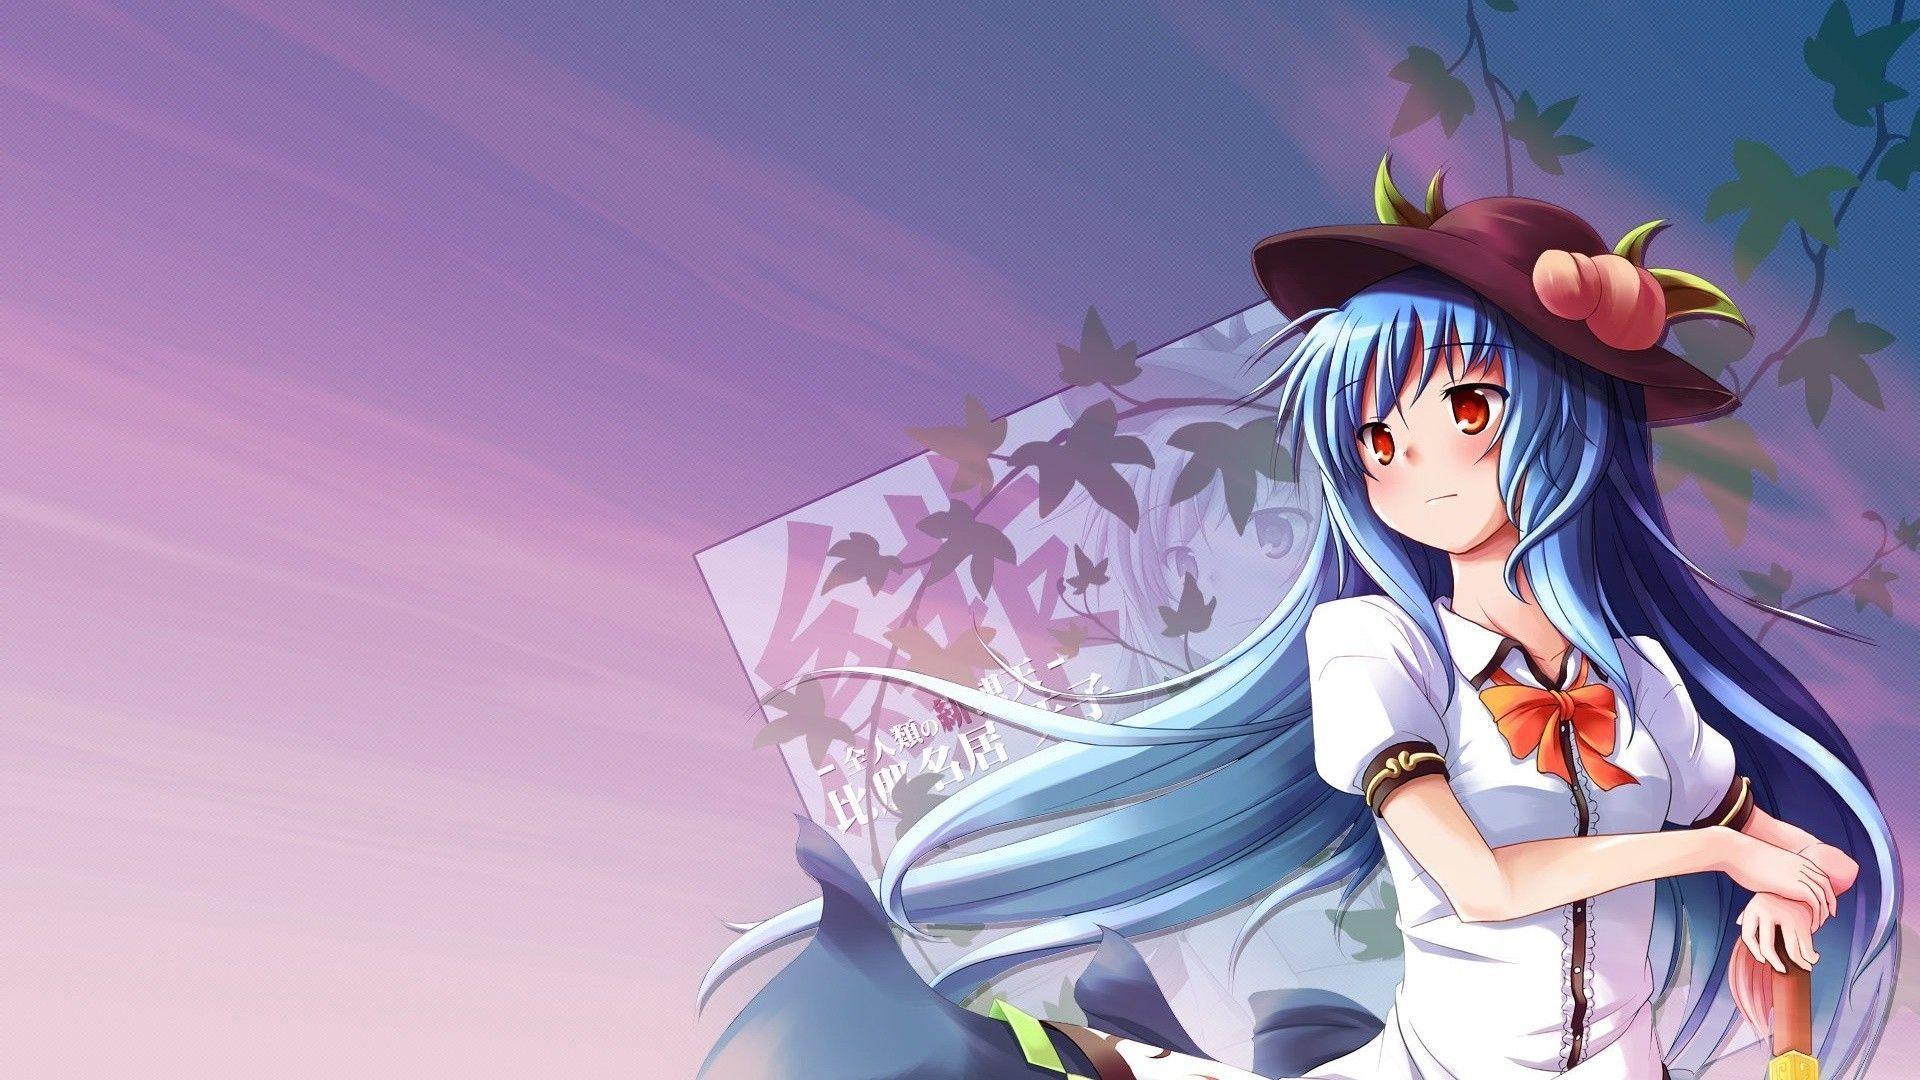 Anime HD Desktop Wallpapers for Widescreen